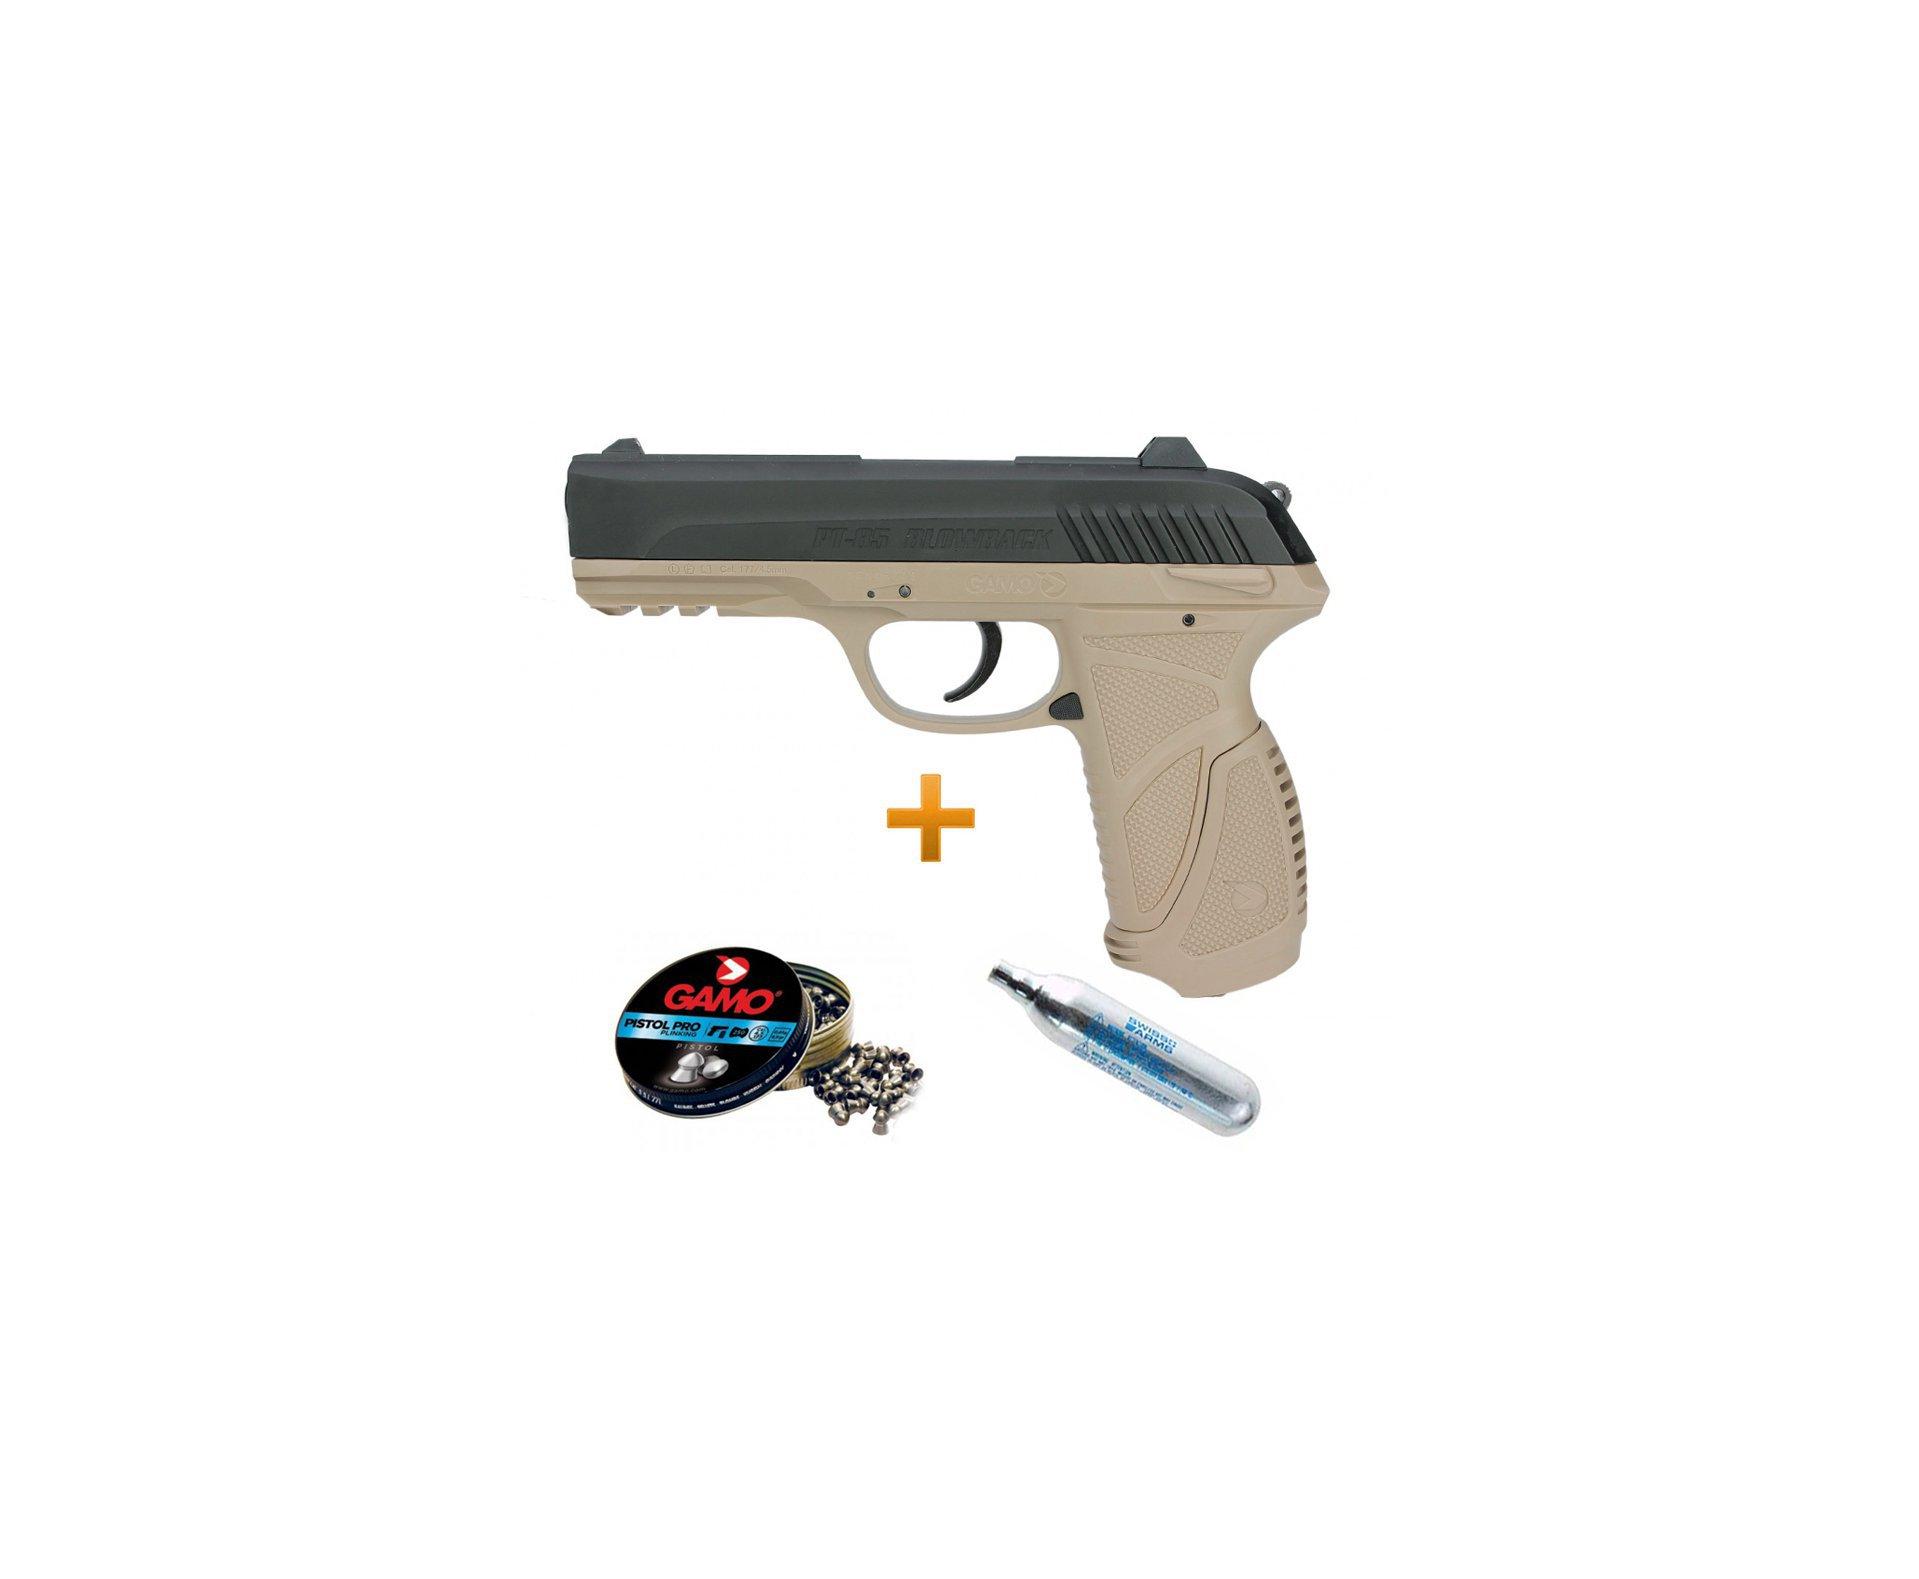 Pistola Pressão Gamo Gás Co2 Pt-85 Blowback Slide Metal Desert 4.5mm + Chumbinho + Cilindro Co2